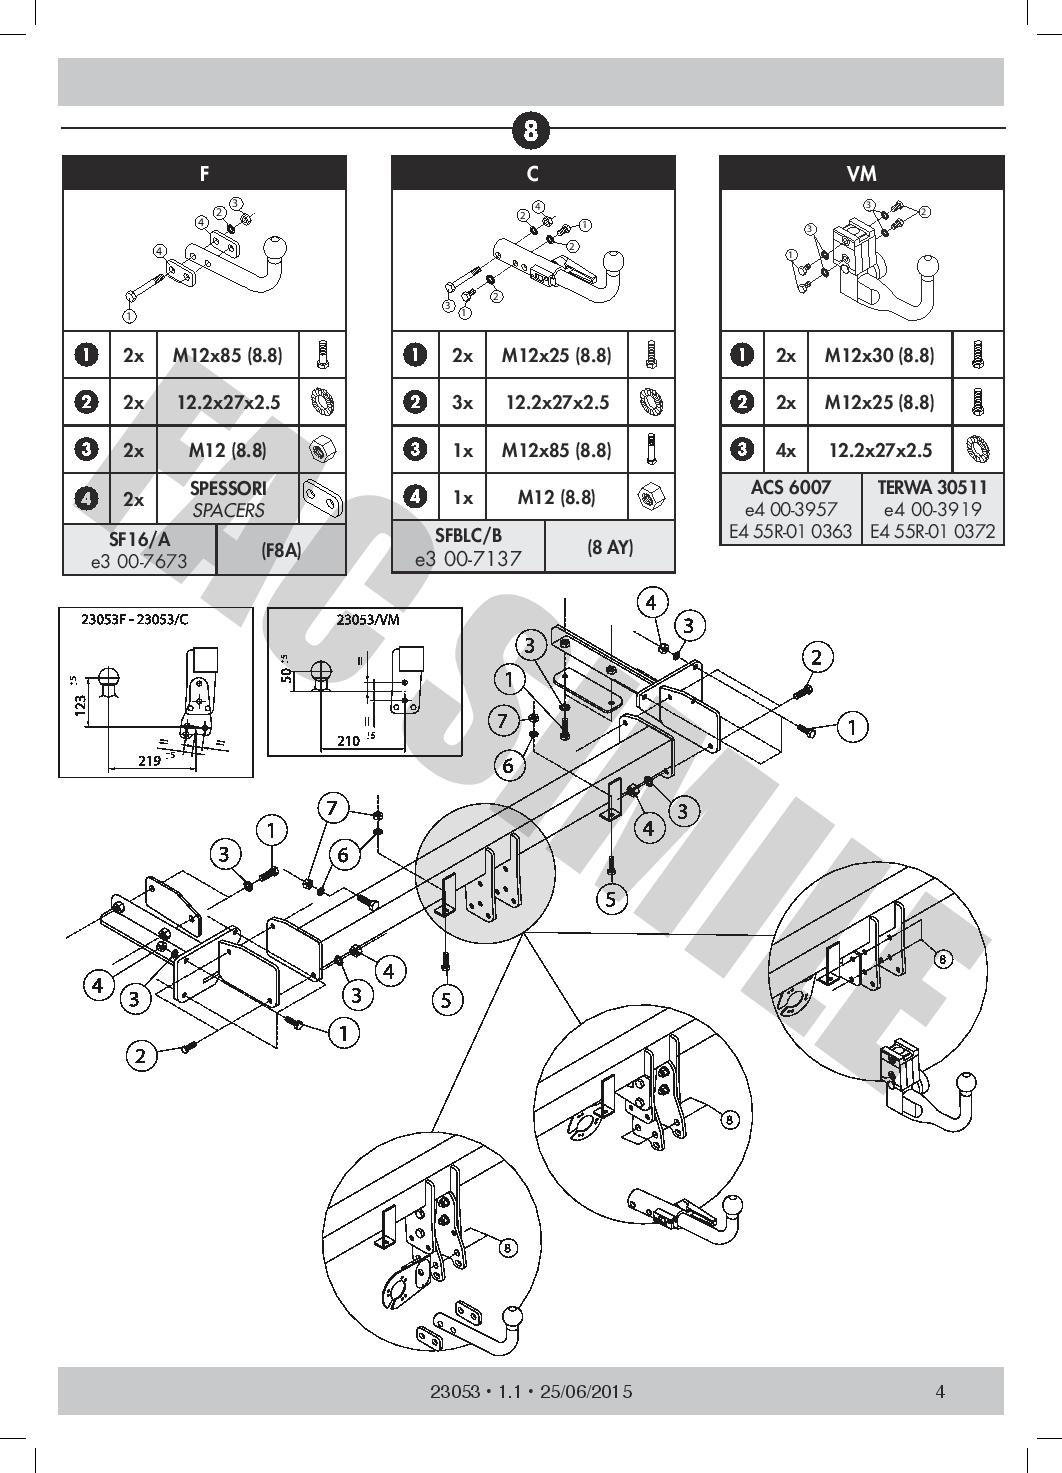 Bola Remolque Fija Cisne Kit C2 7p para Mercedes C CLASS BERLINA 00-07 230F/_A1